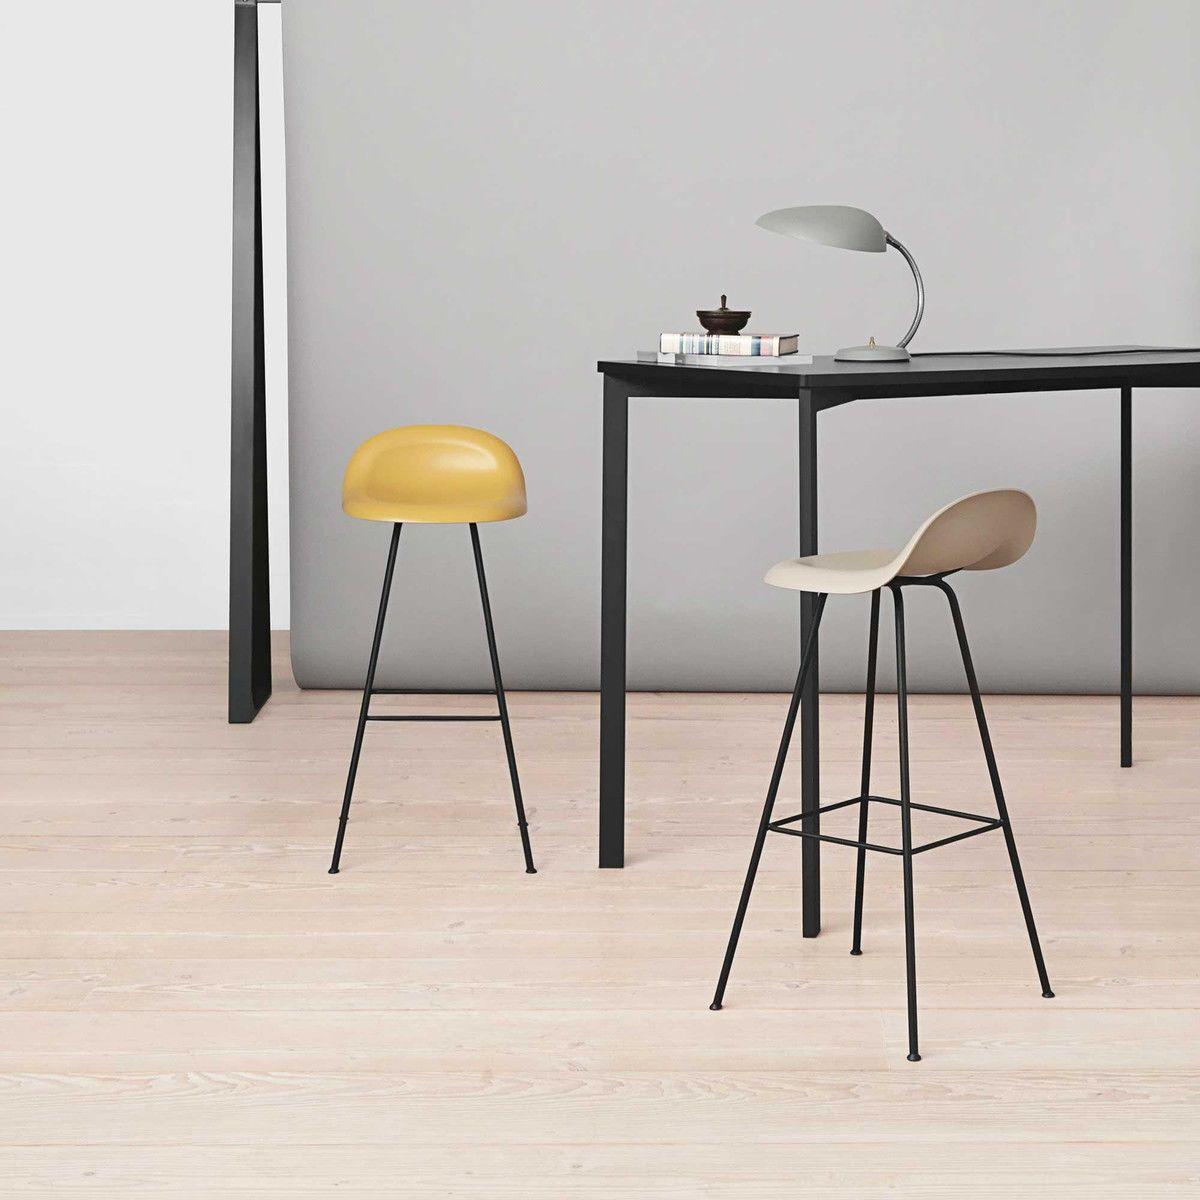 Gubi 3d bar stool barhocker gubi for Barhocker 3d